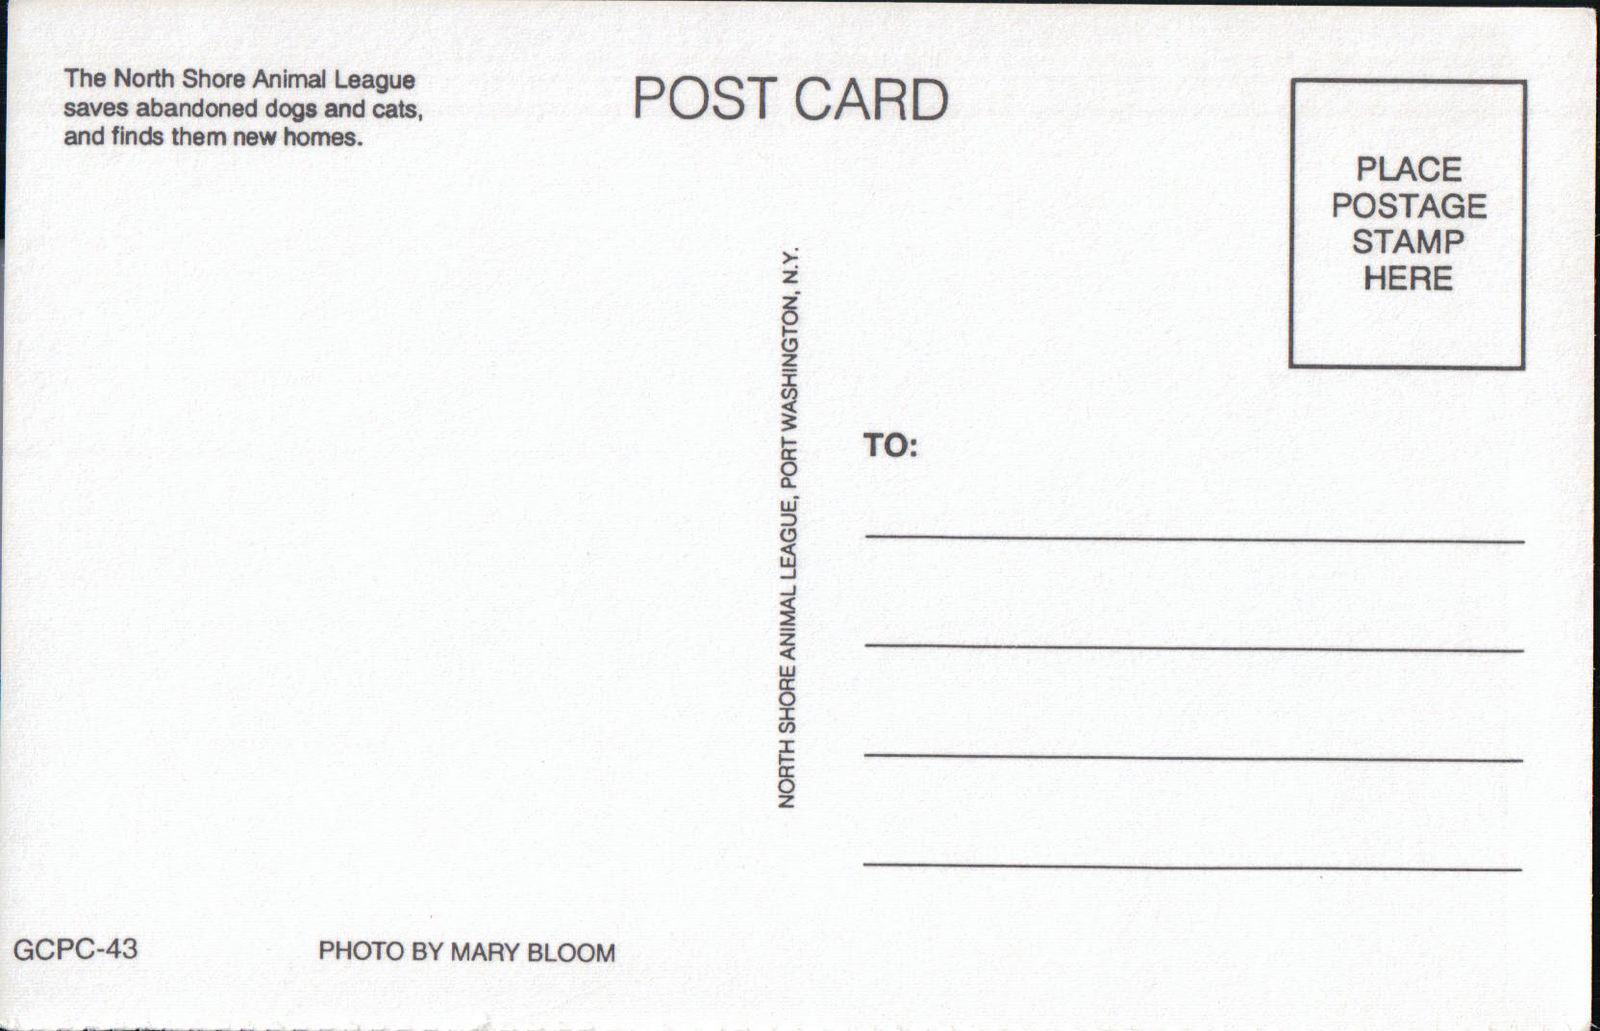 North Shore Animal League Post Card